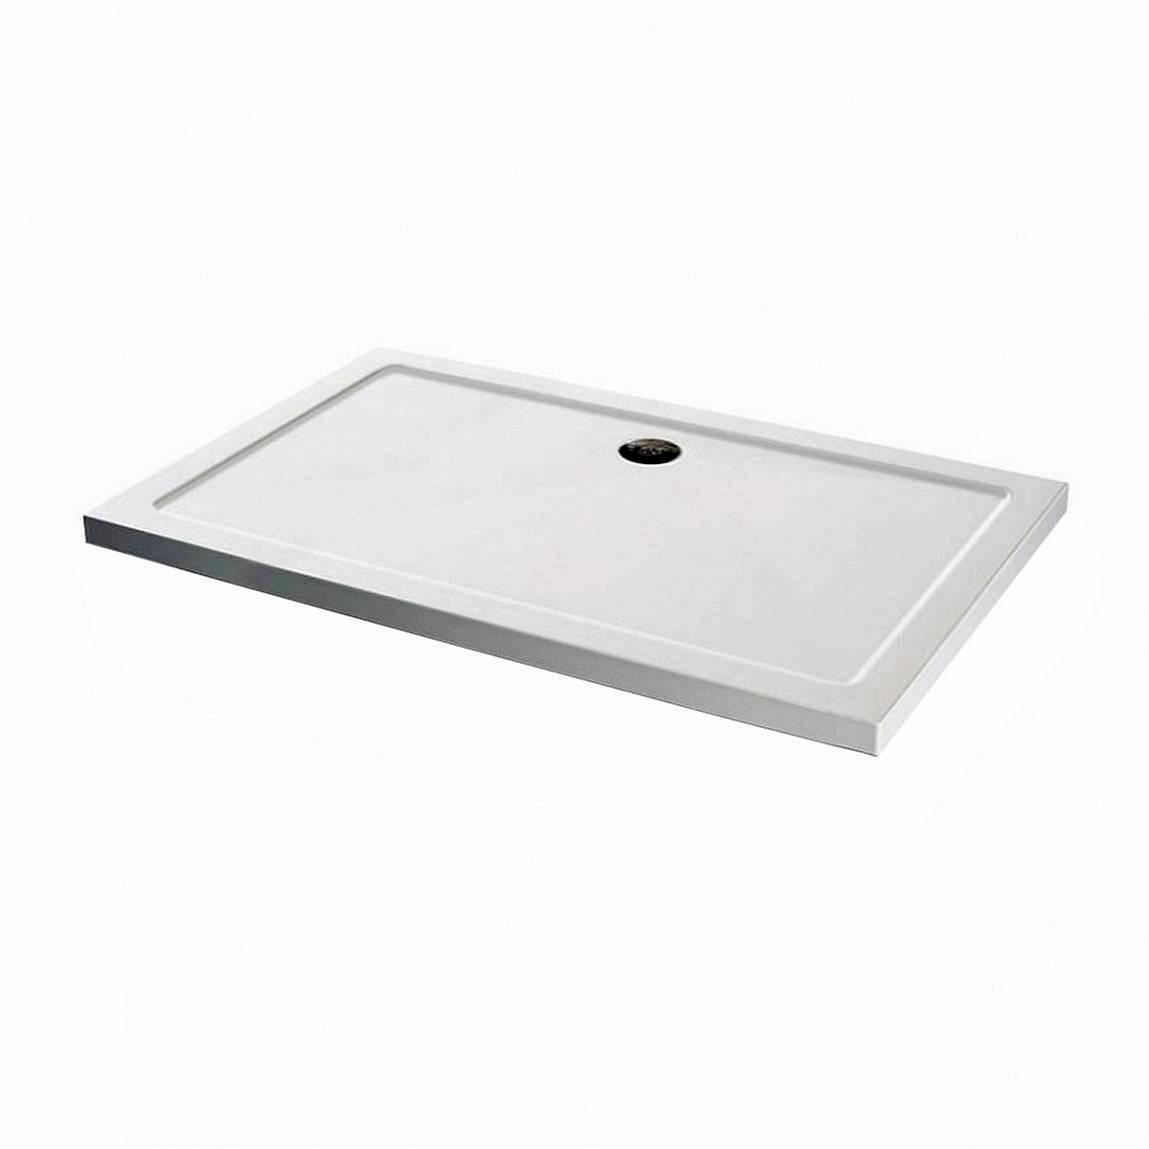 Image of Rectangular Stone Shower Tray 1000 x 800